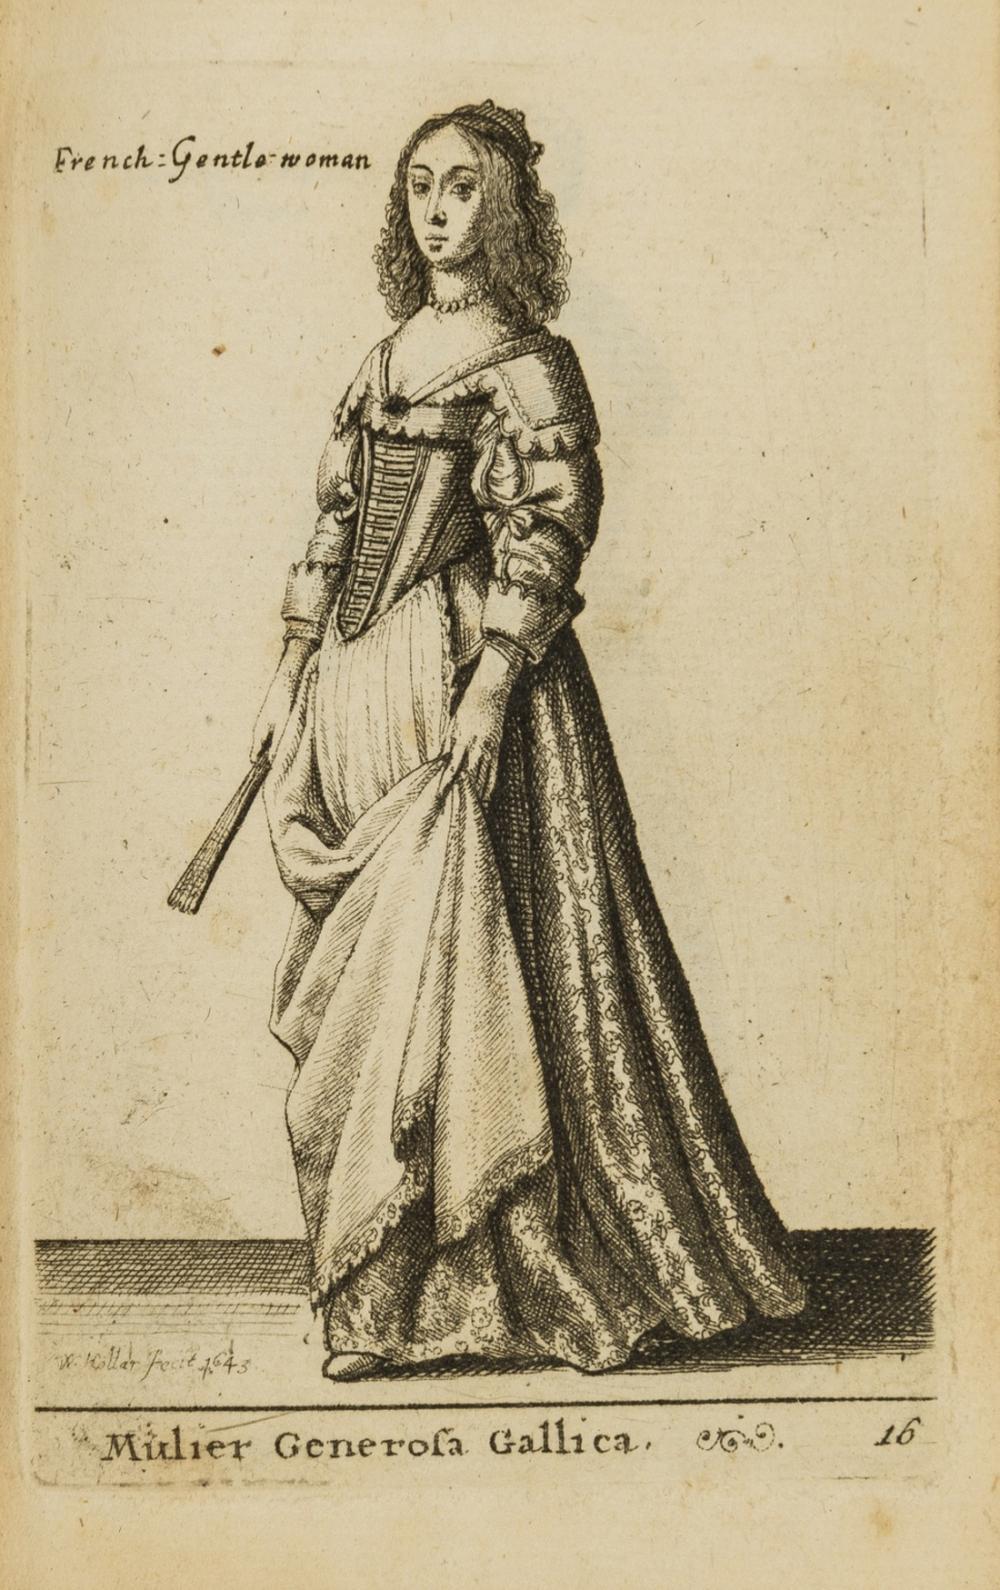 Hollar (Wenceslaus) Theatru[m] mulierum, sive varietas atq. differentia habitum foeminei sexus..., 48 engraved plates, Henry Overton, 1643.